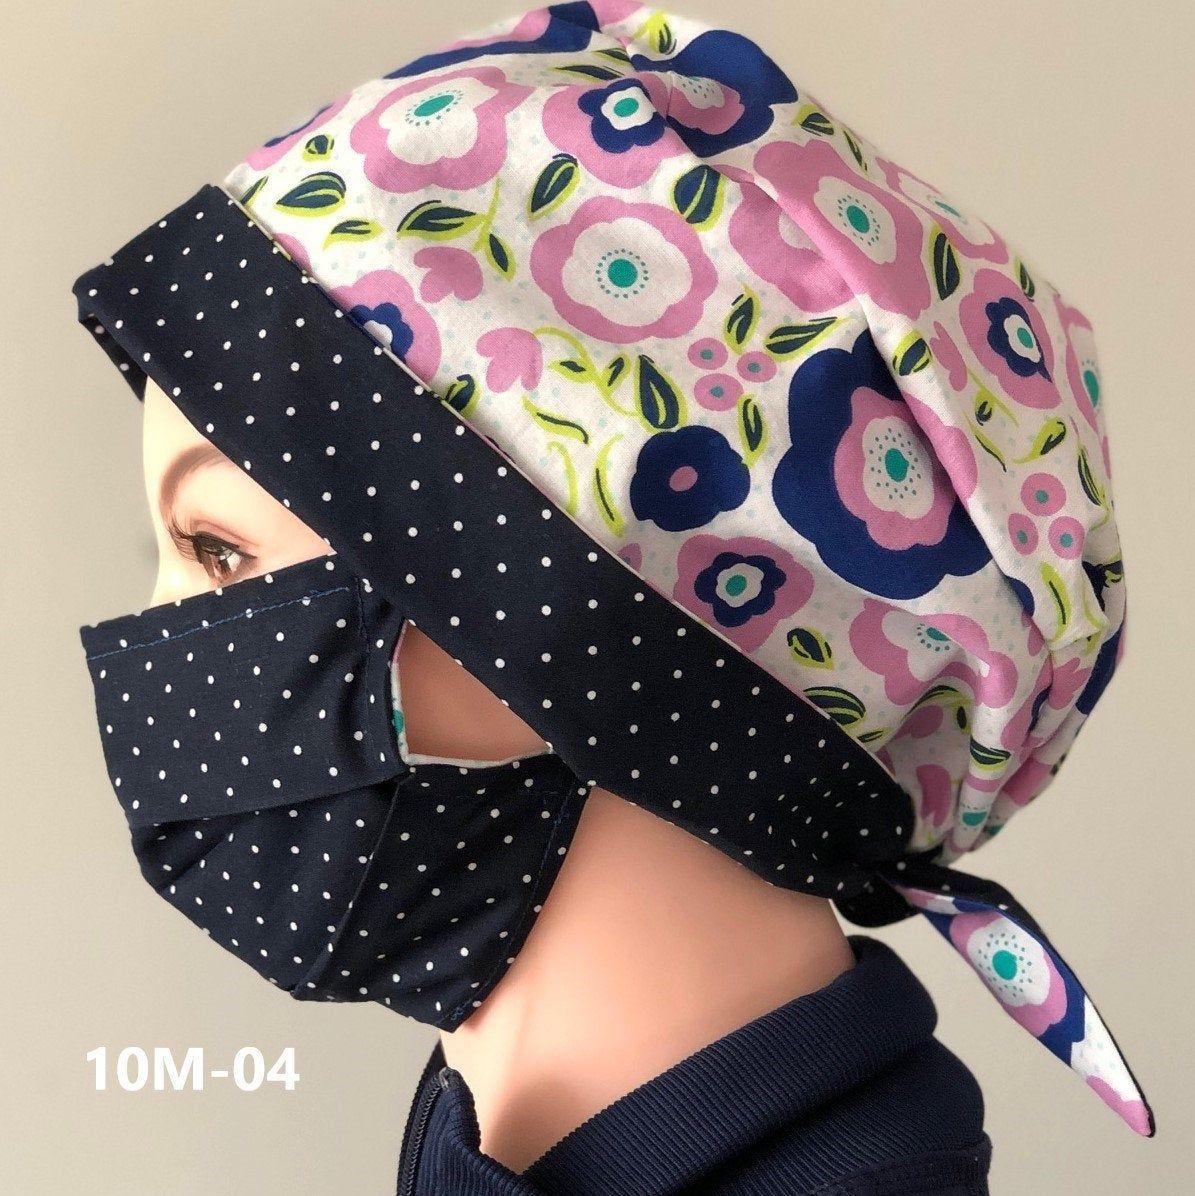 Floral Face Masks Fashionable Face MasksColorful Face